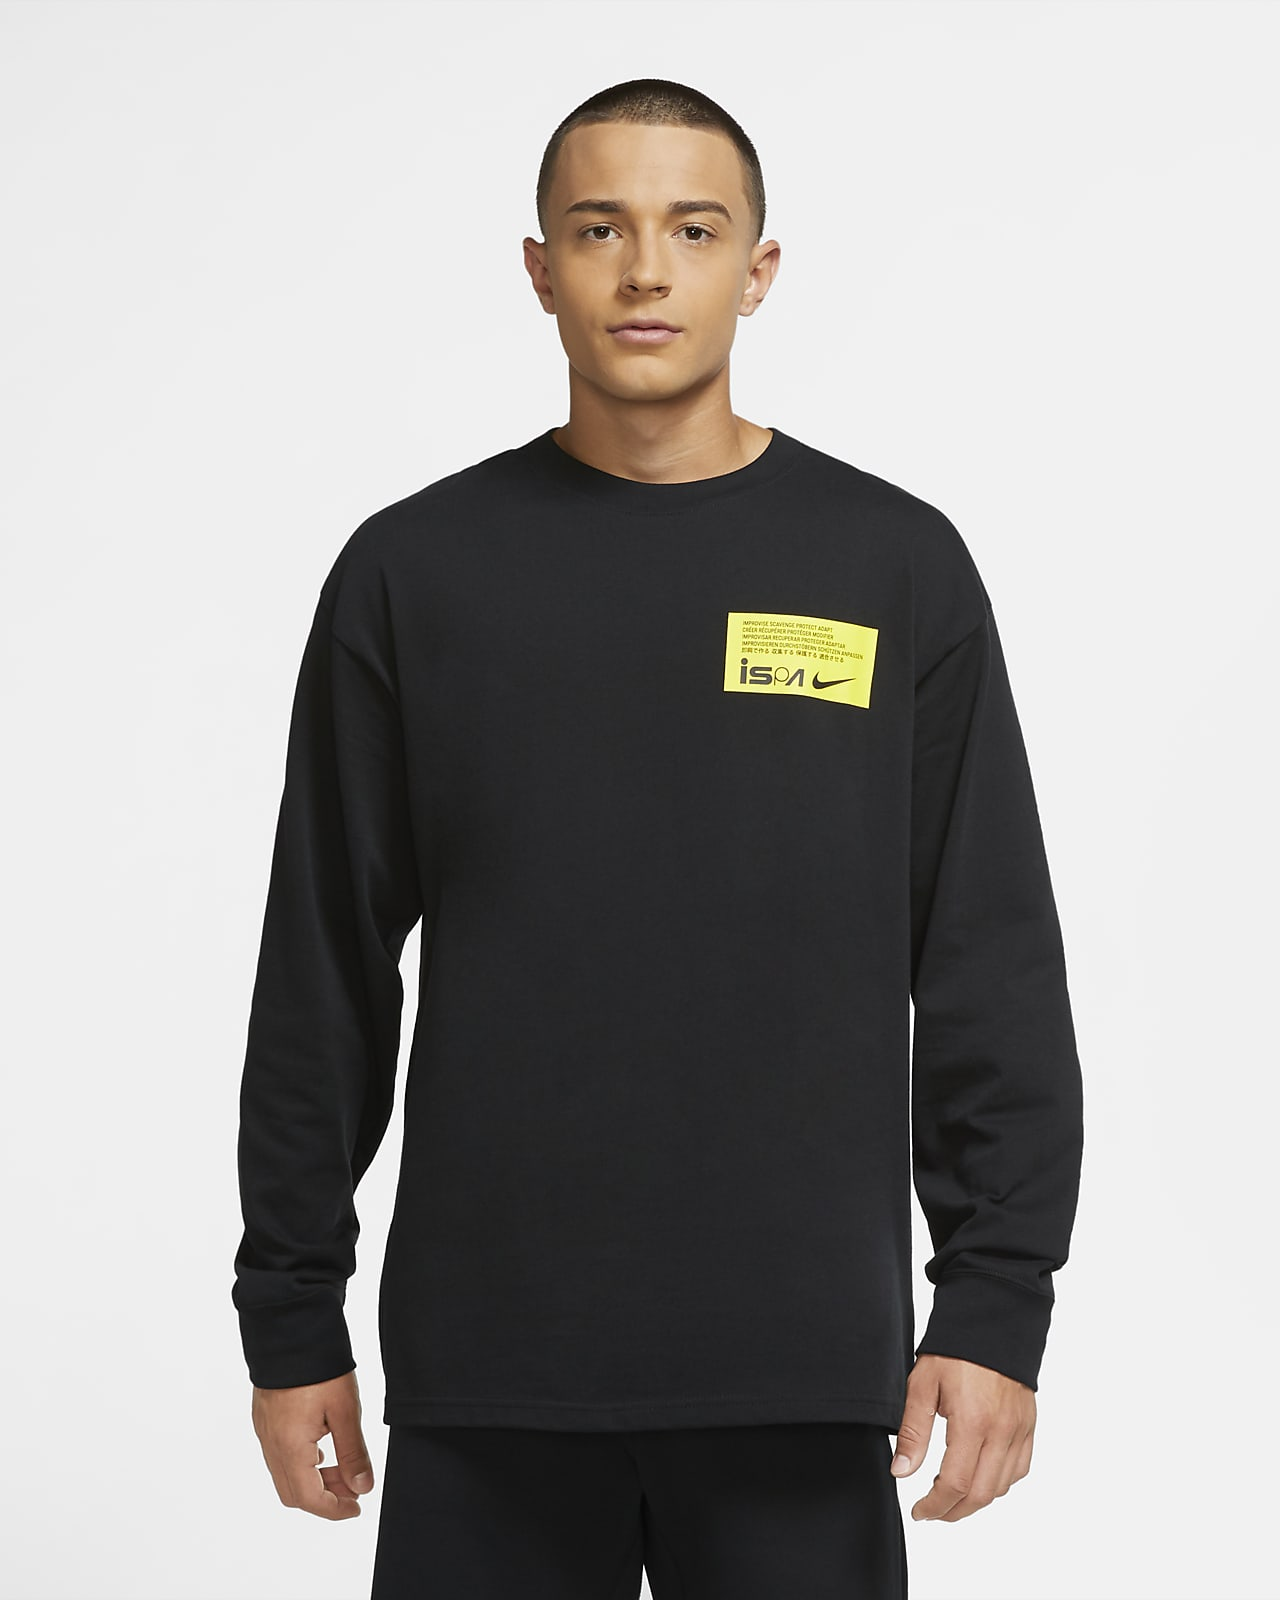 Nike ISPA Camiseta de manga larga - Hombre